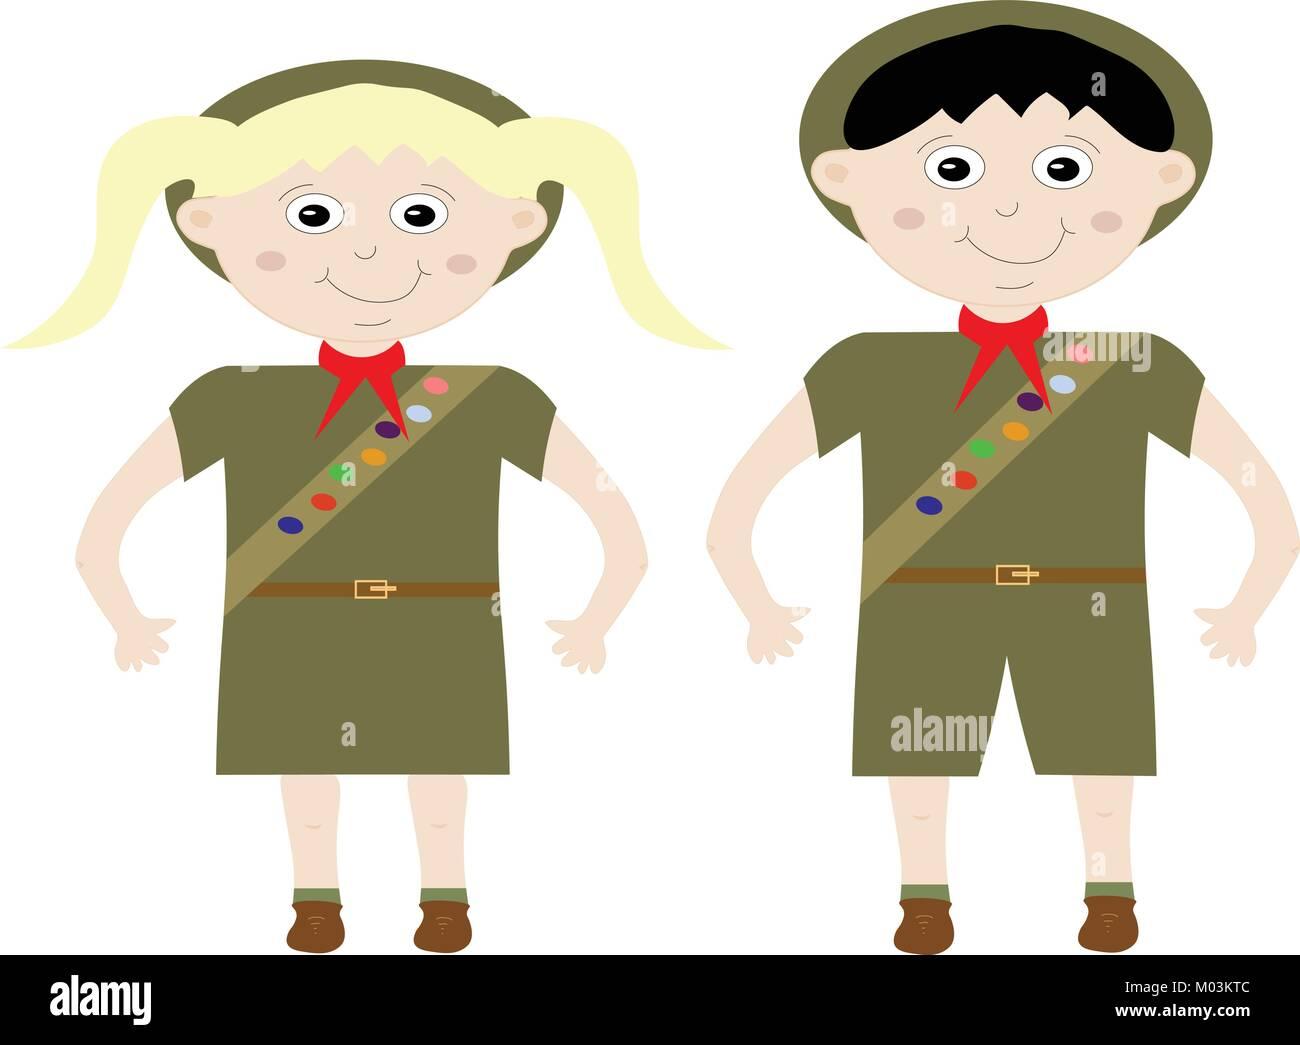 Boy Scouts Badge Imagenes De Stock Amp Boy Scouts Badge Fotos De Stock